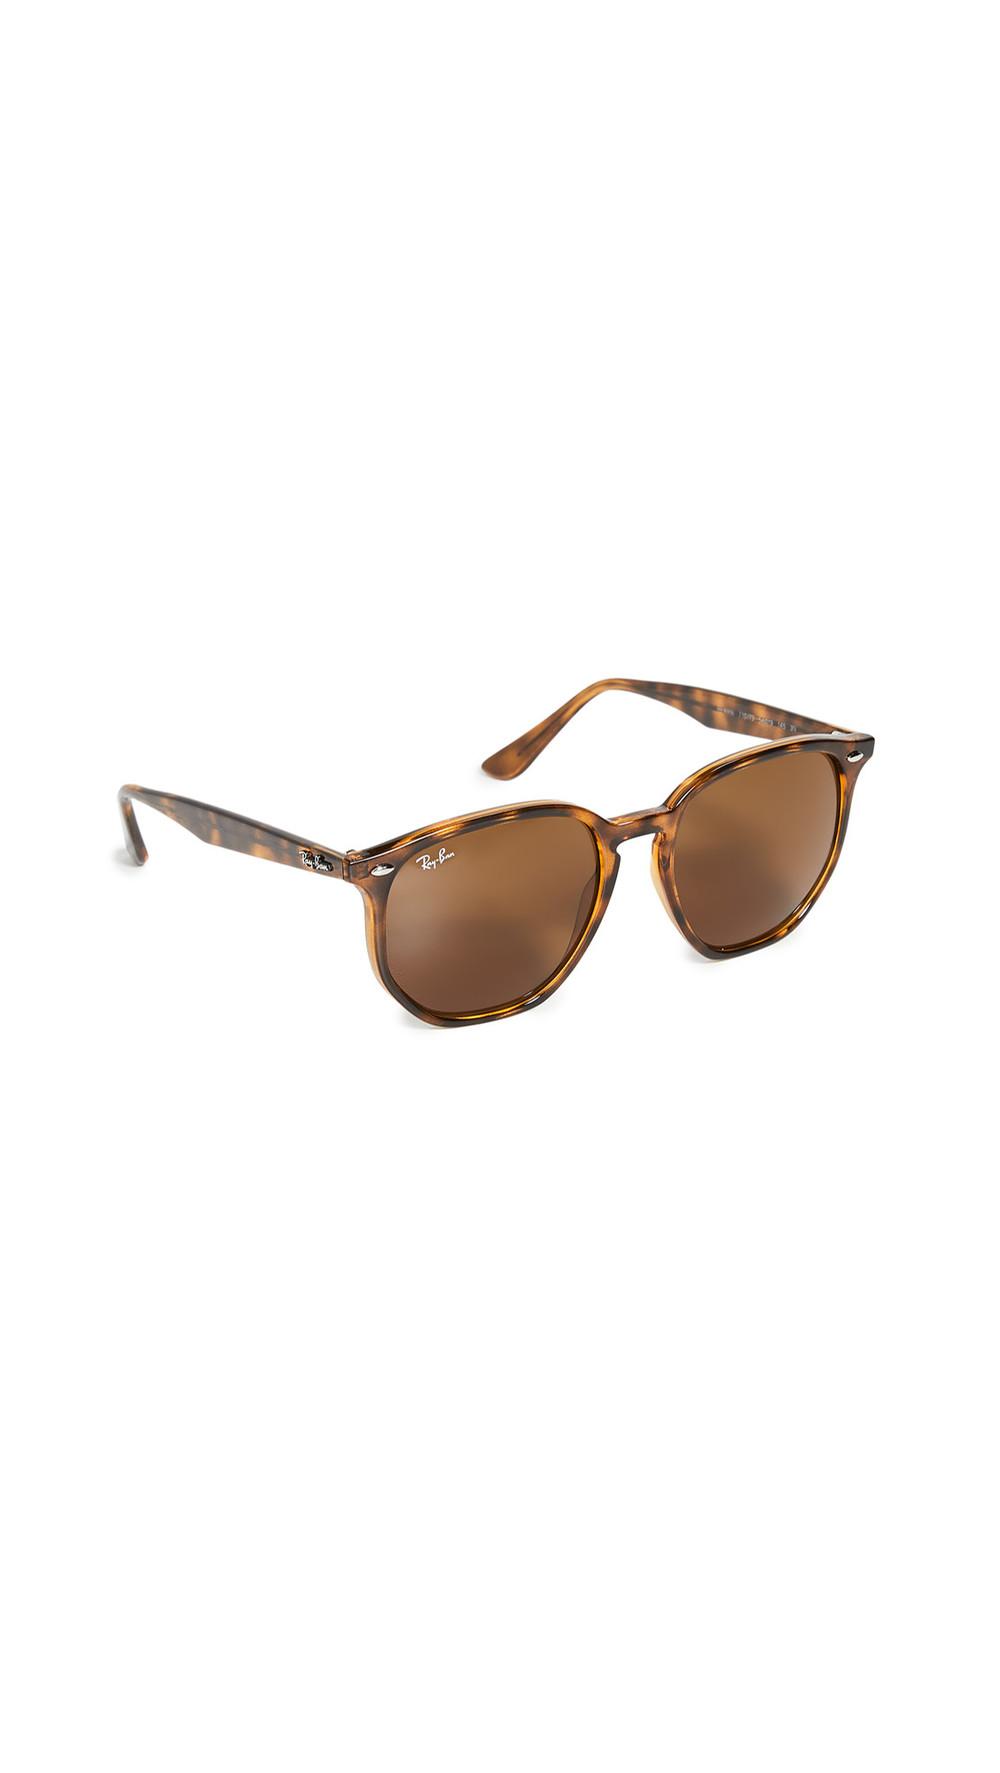 Ray-Ban Highstreet Hexagonal Sunglasses in brown